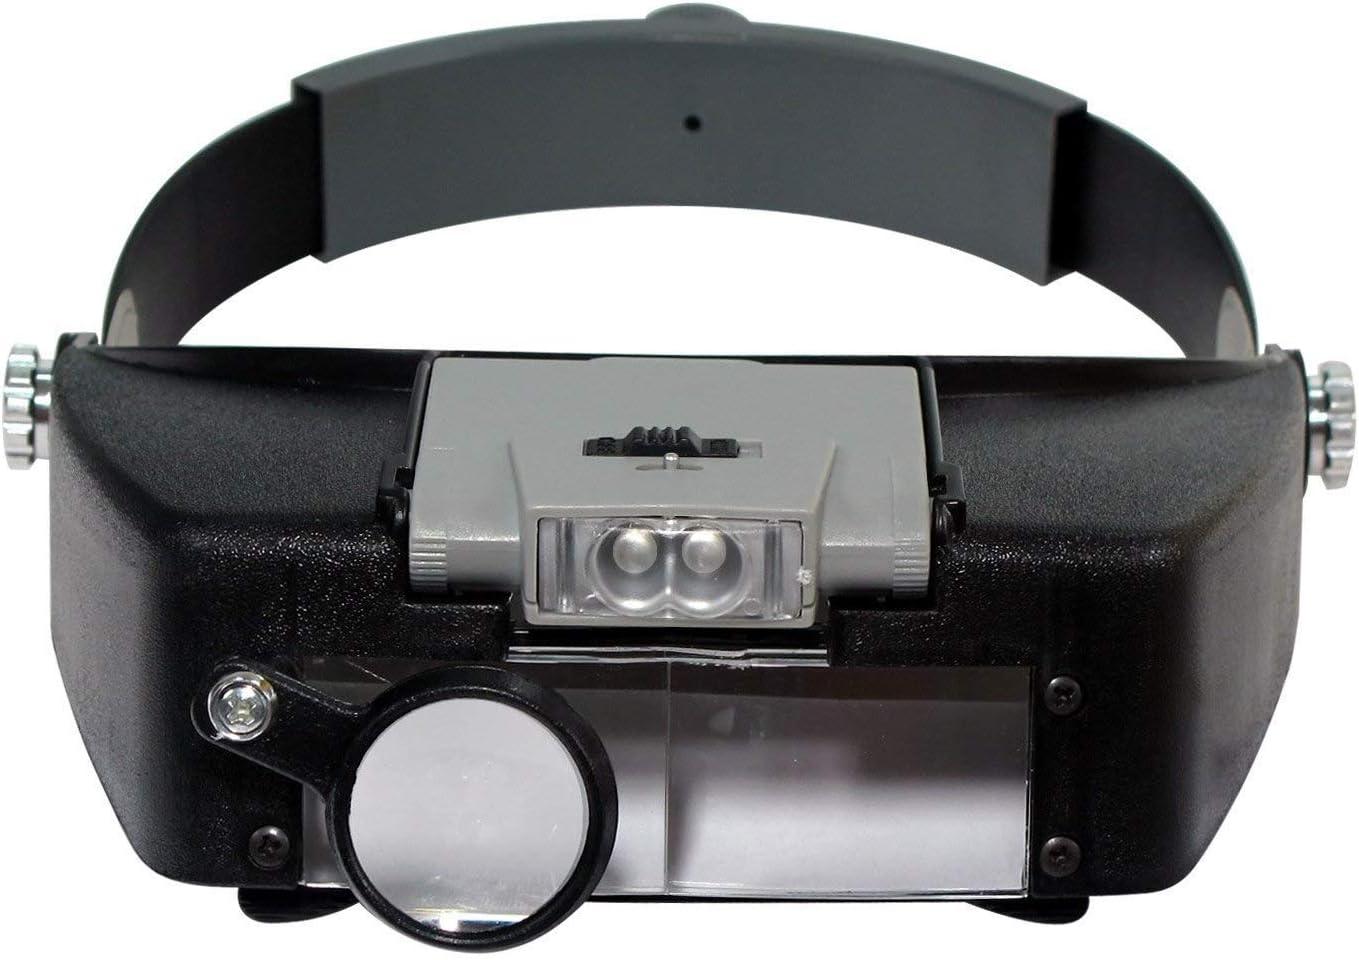 TTWUJIN Lupa HD HD HD Mantenimiento de cabeza Mantenimiento Lupa de lupa Alta Ampliación Gafas Gafas Vidrios Pestañas Belleza Belleza Pestañas Lupa de lupa con luz Ultra Luz Ayuda Lectura Portátil